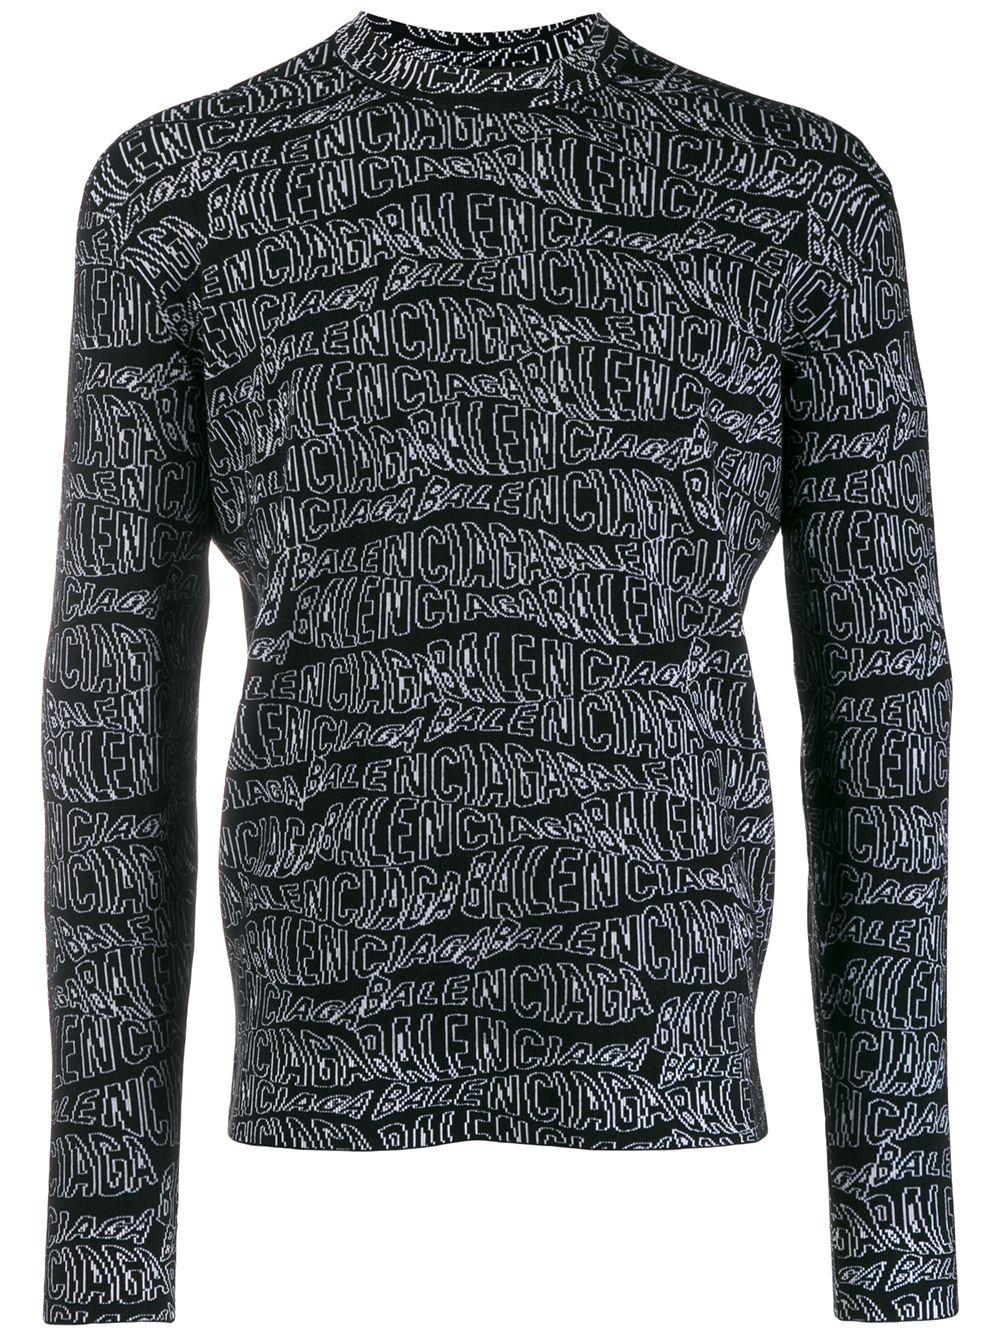 black and white virgin wool blend jumper with Balecniaga logo intarsia all over BALENCIAGA |  | 583154-T15351000